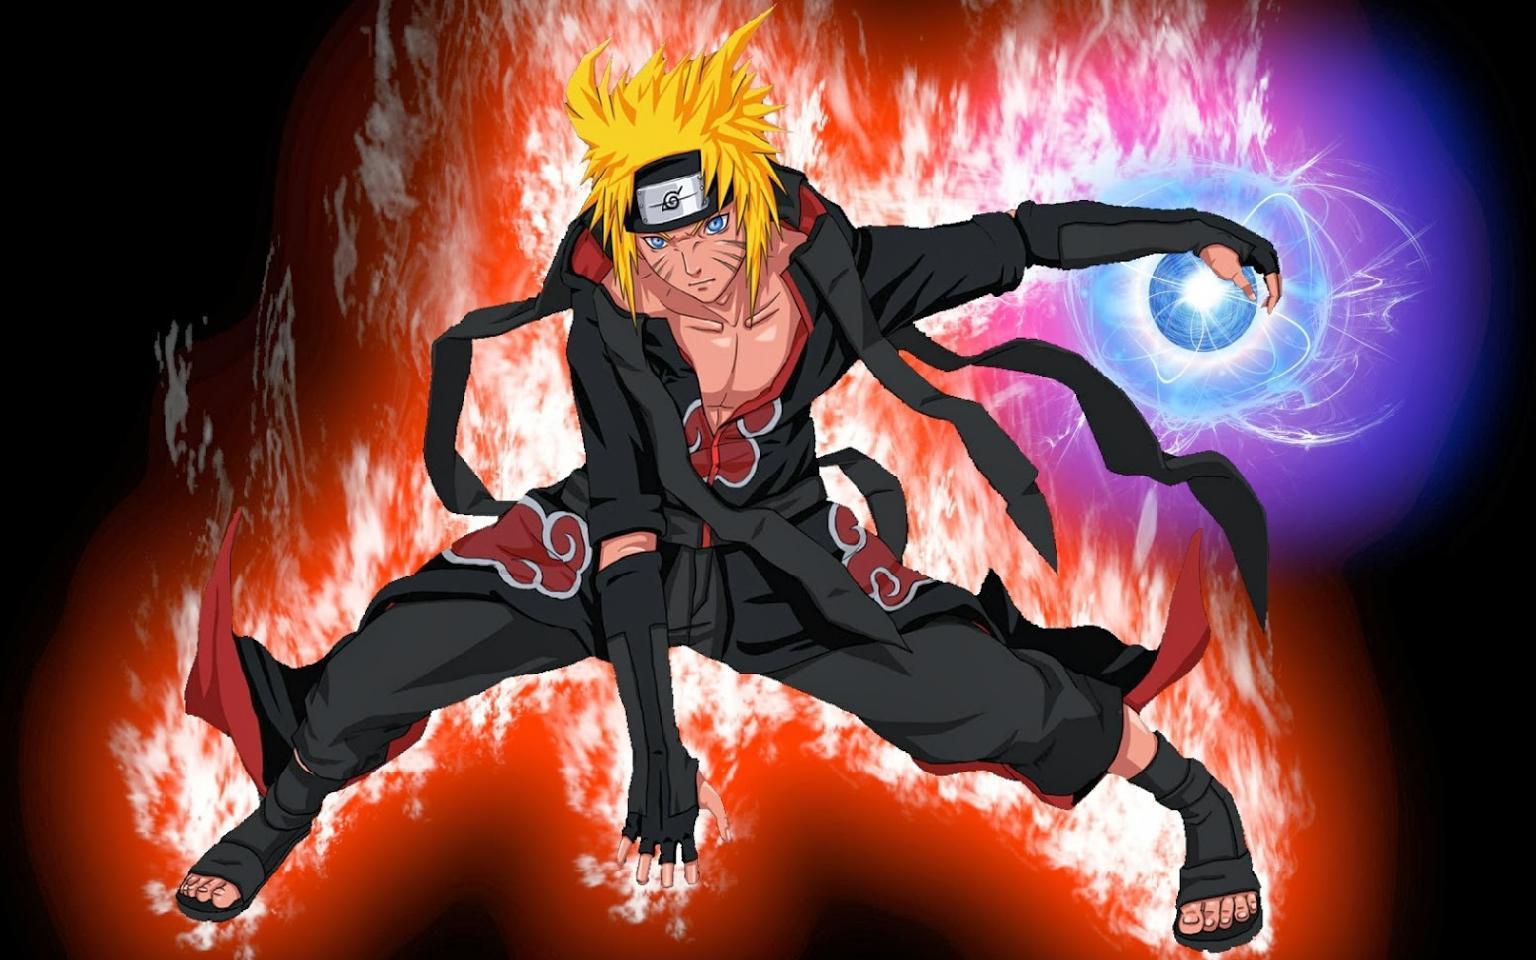 Kumpulan Gambar Naruto Terbaru 2015 - Dunia Internet